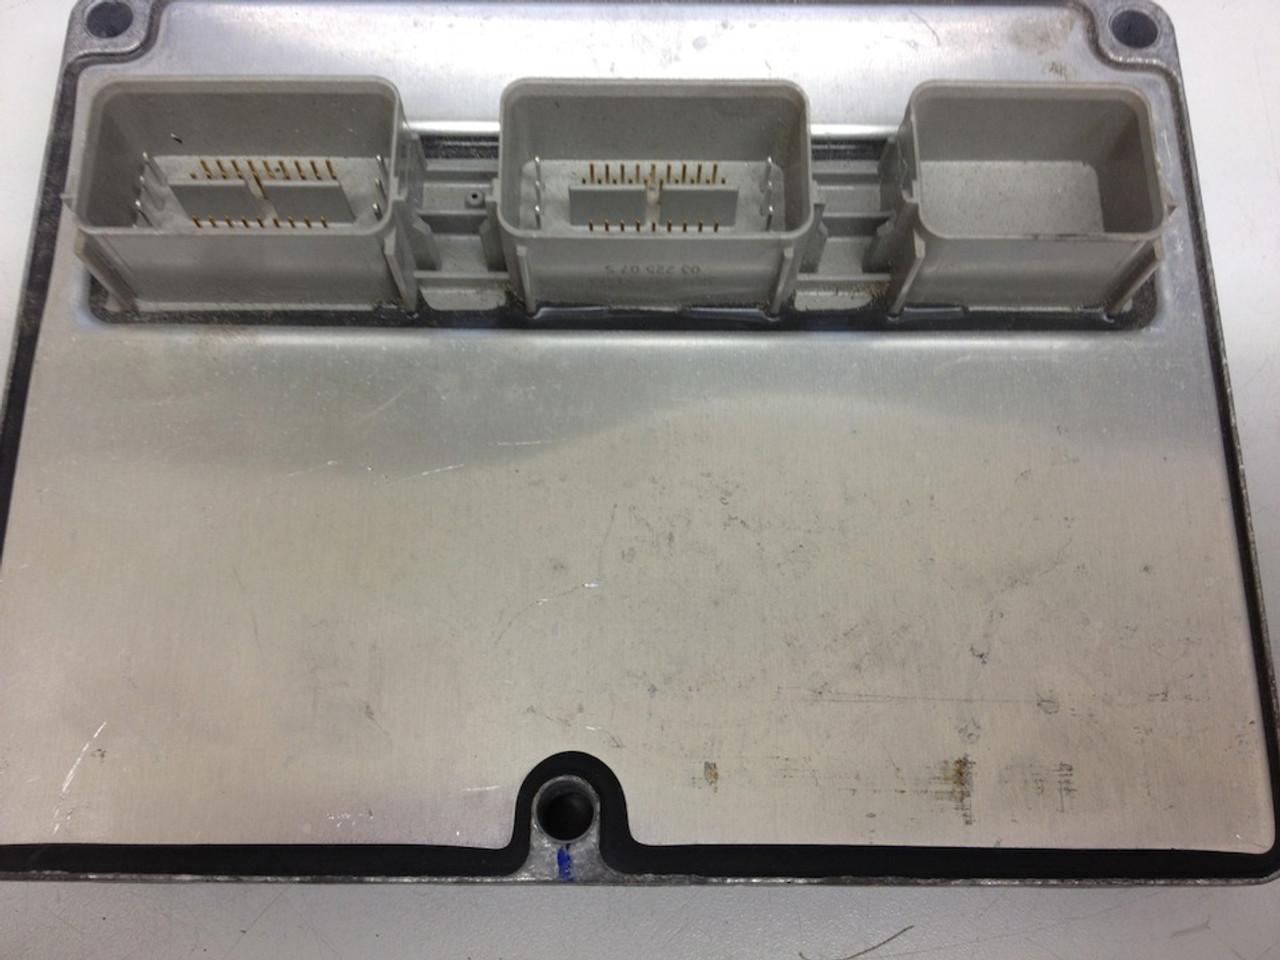 3M51-12A650-GD 4ARD ESU-121